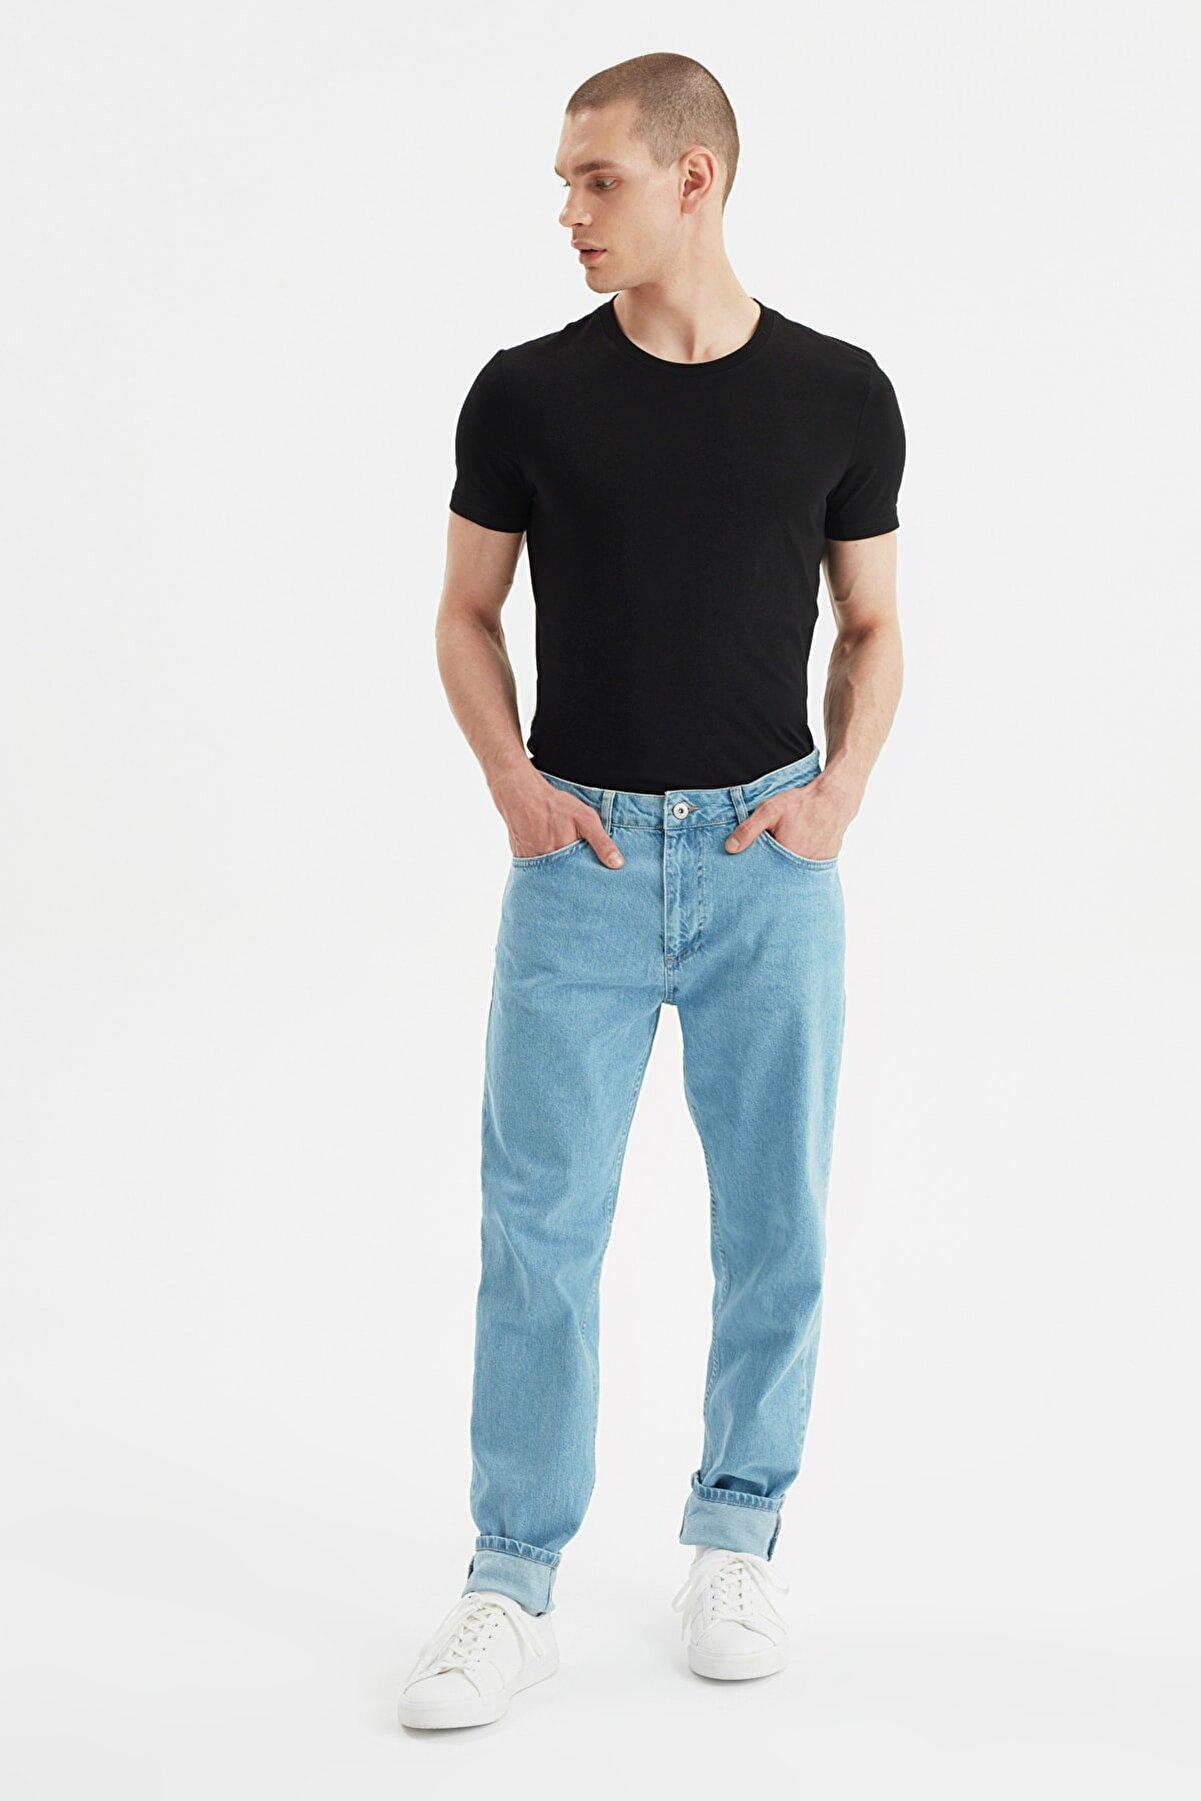 TRENDYOL MAN Mavi Erkek Essential Fit Jeans TMNSS21JE0672